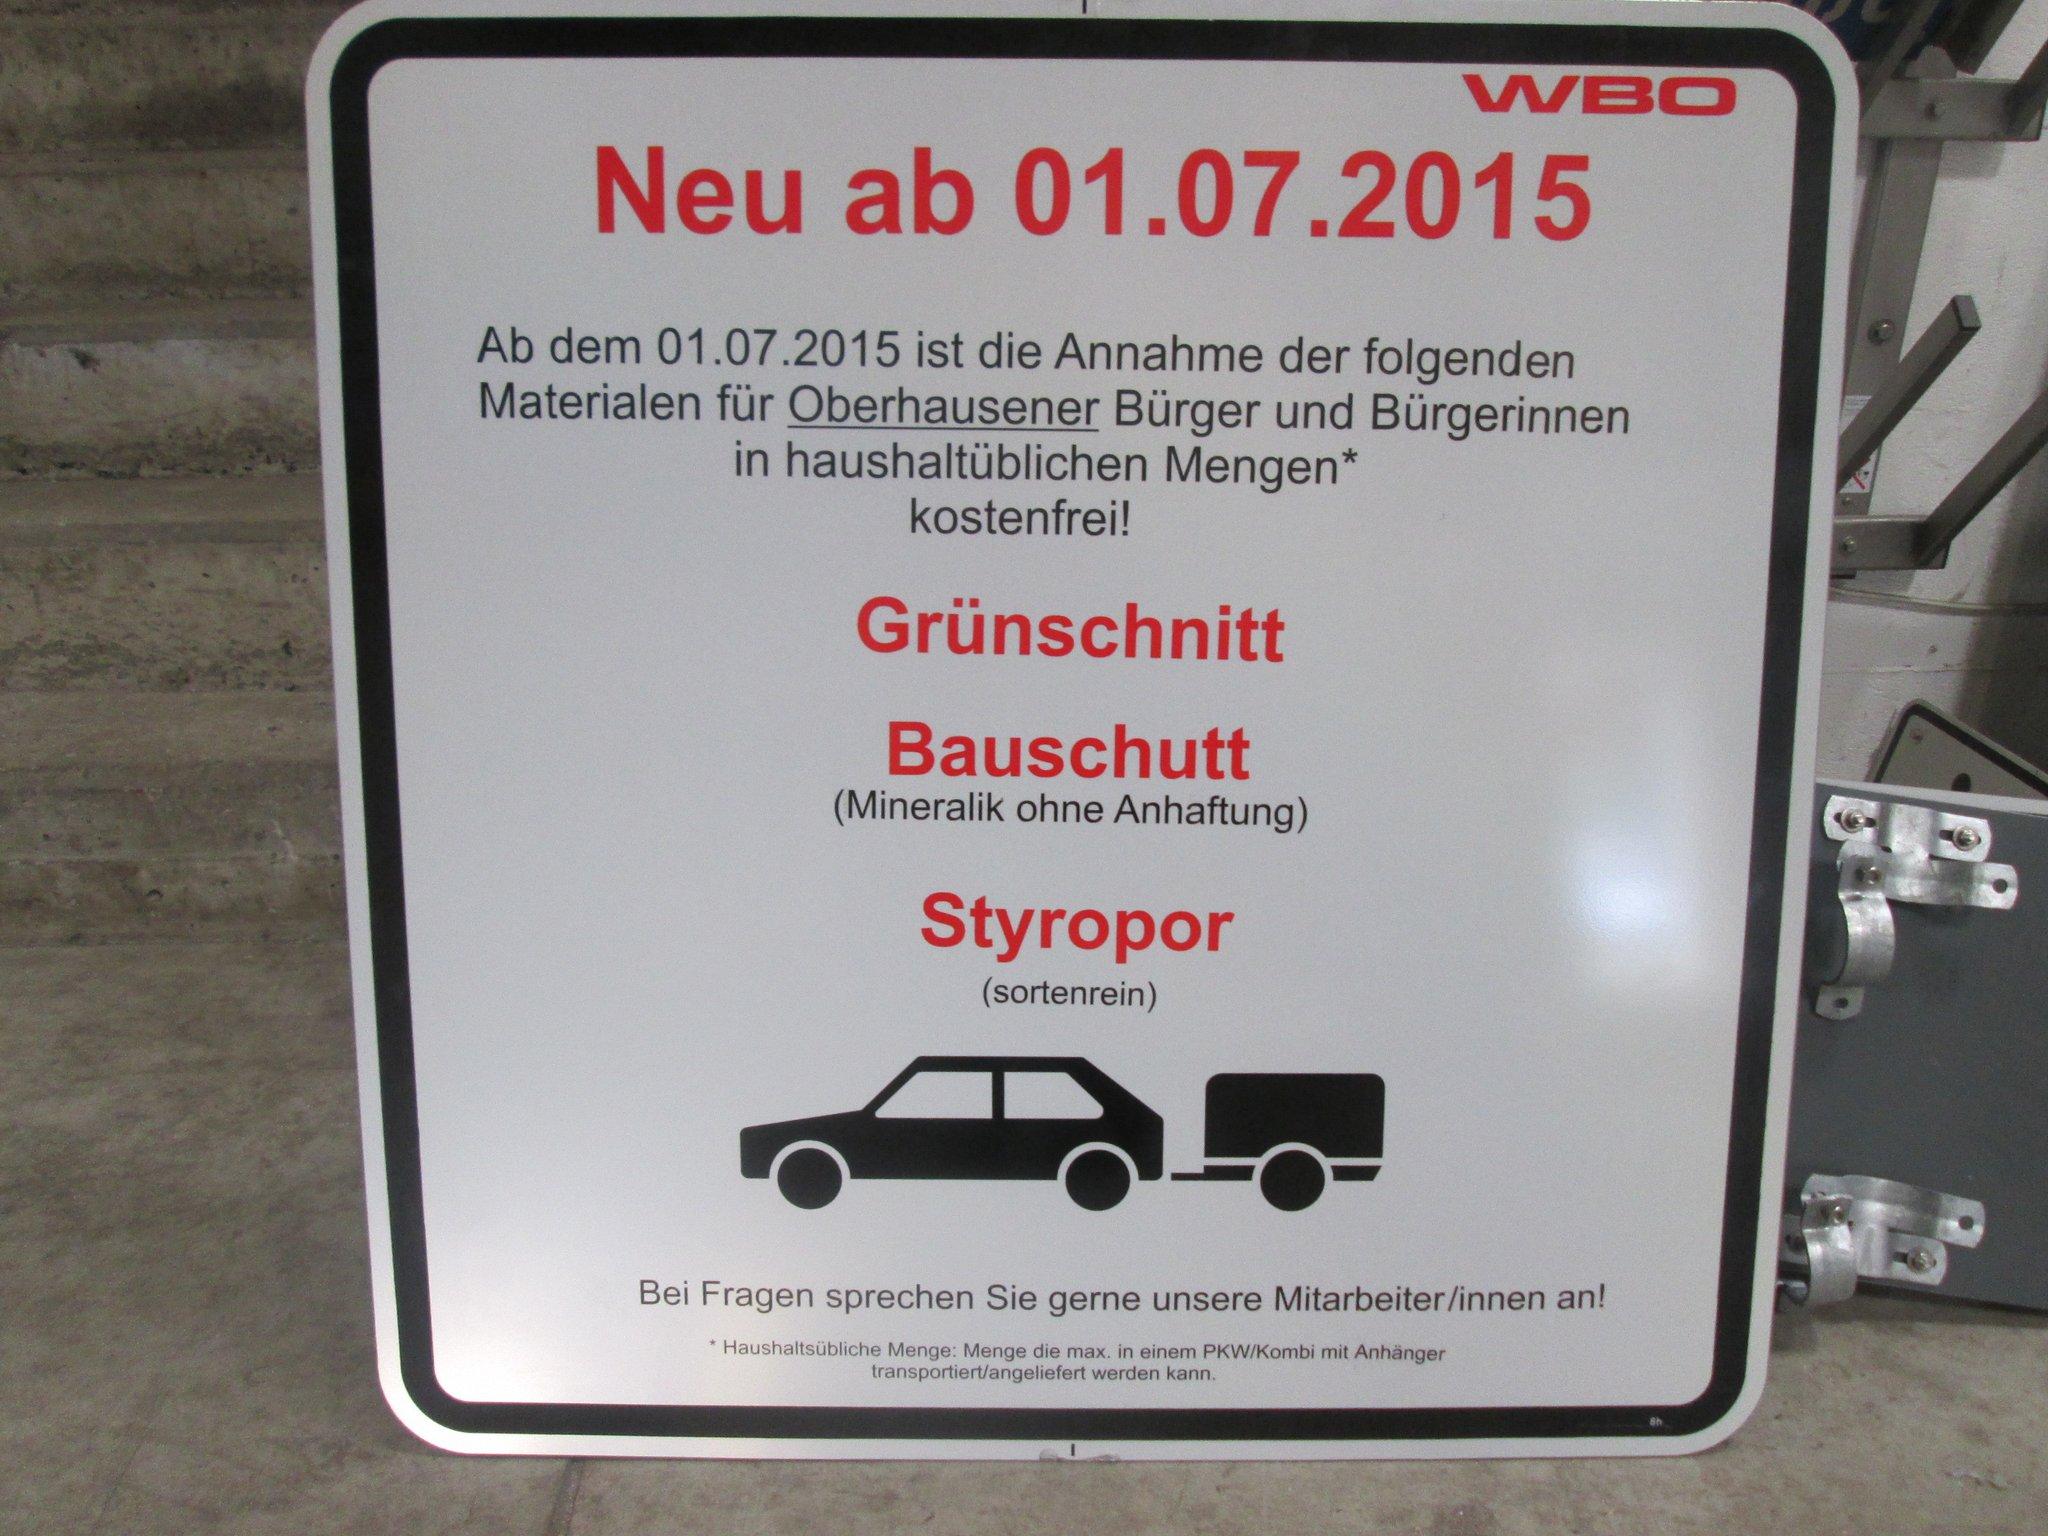 Grünschnitt Bauschutt Und Styropor Ab 1 Juli Kostenlos Am